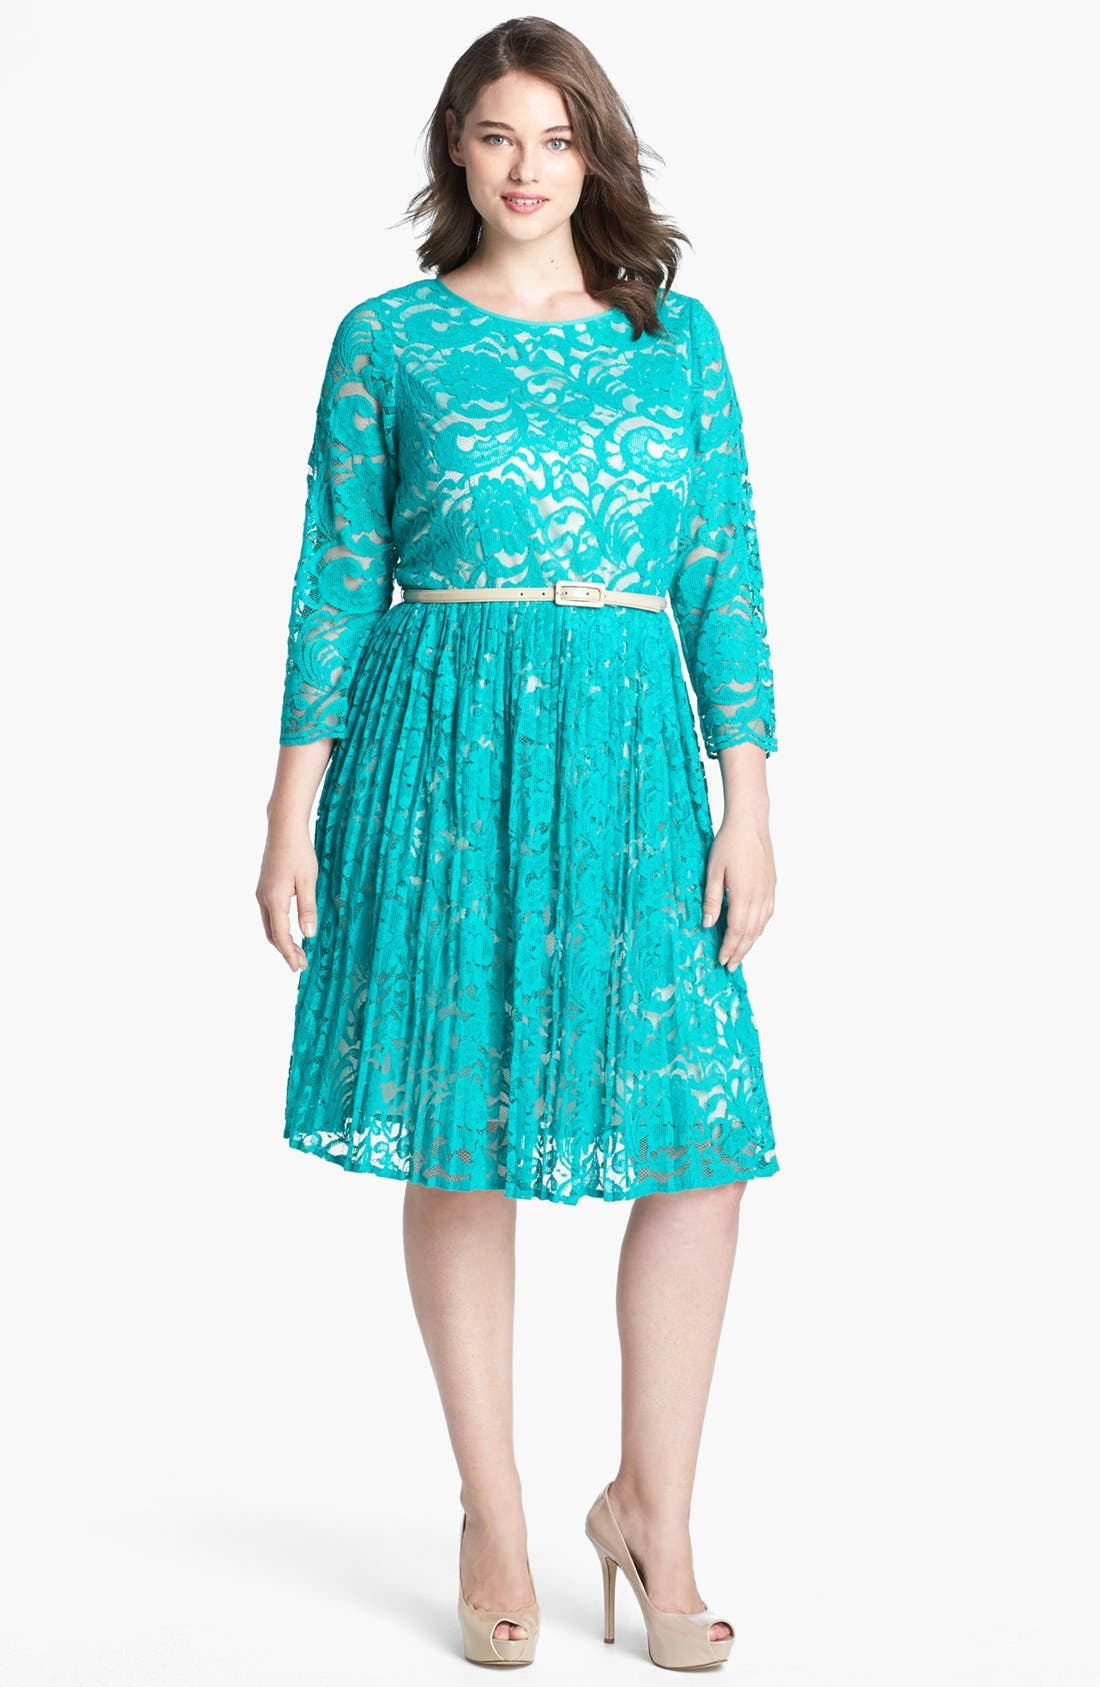 Alternate Image 1 Selected - Eliza J Lace Fit & Flare Dress (Plus Size)